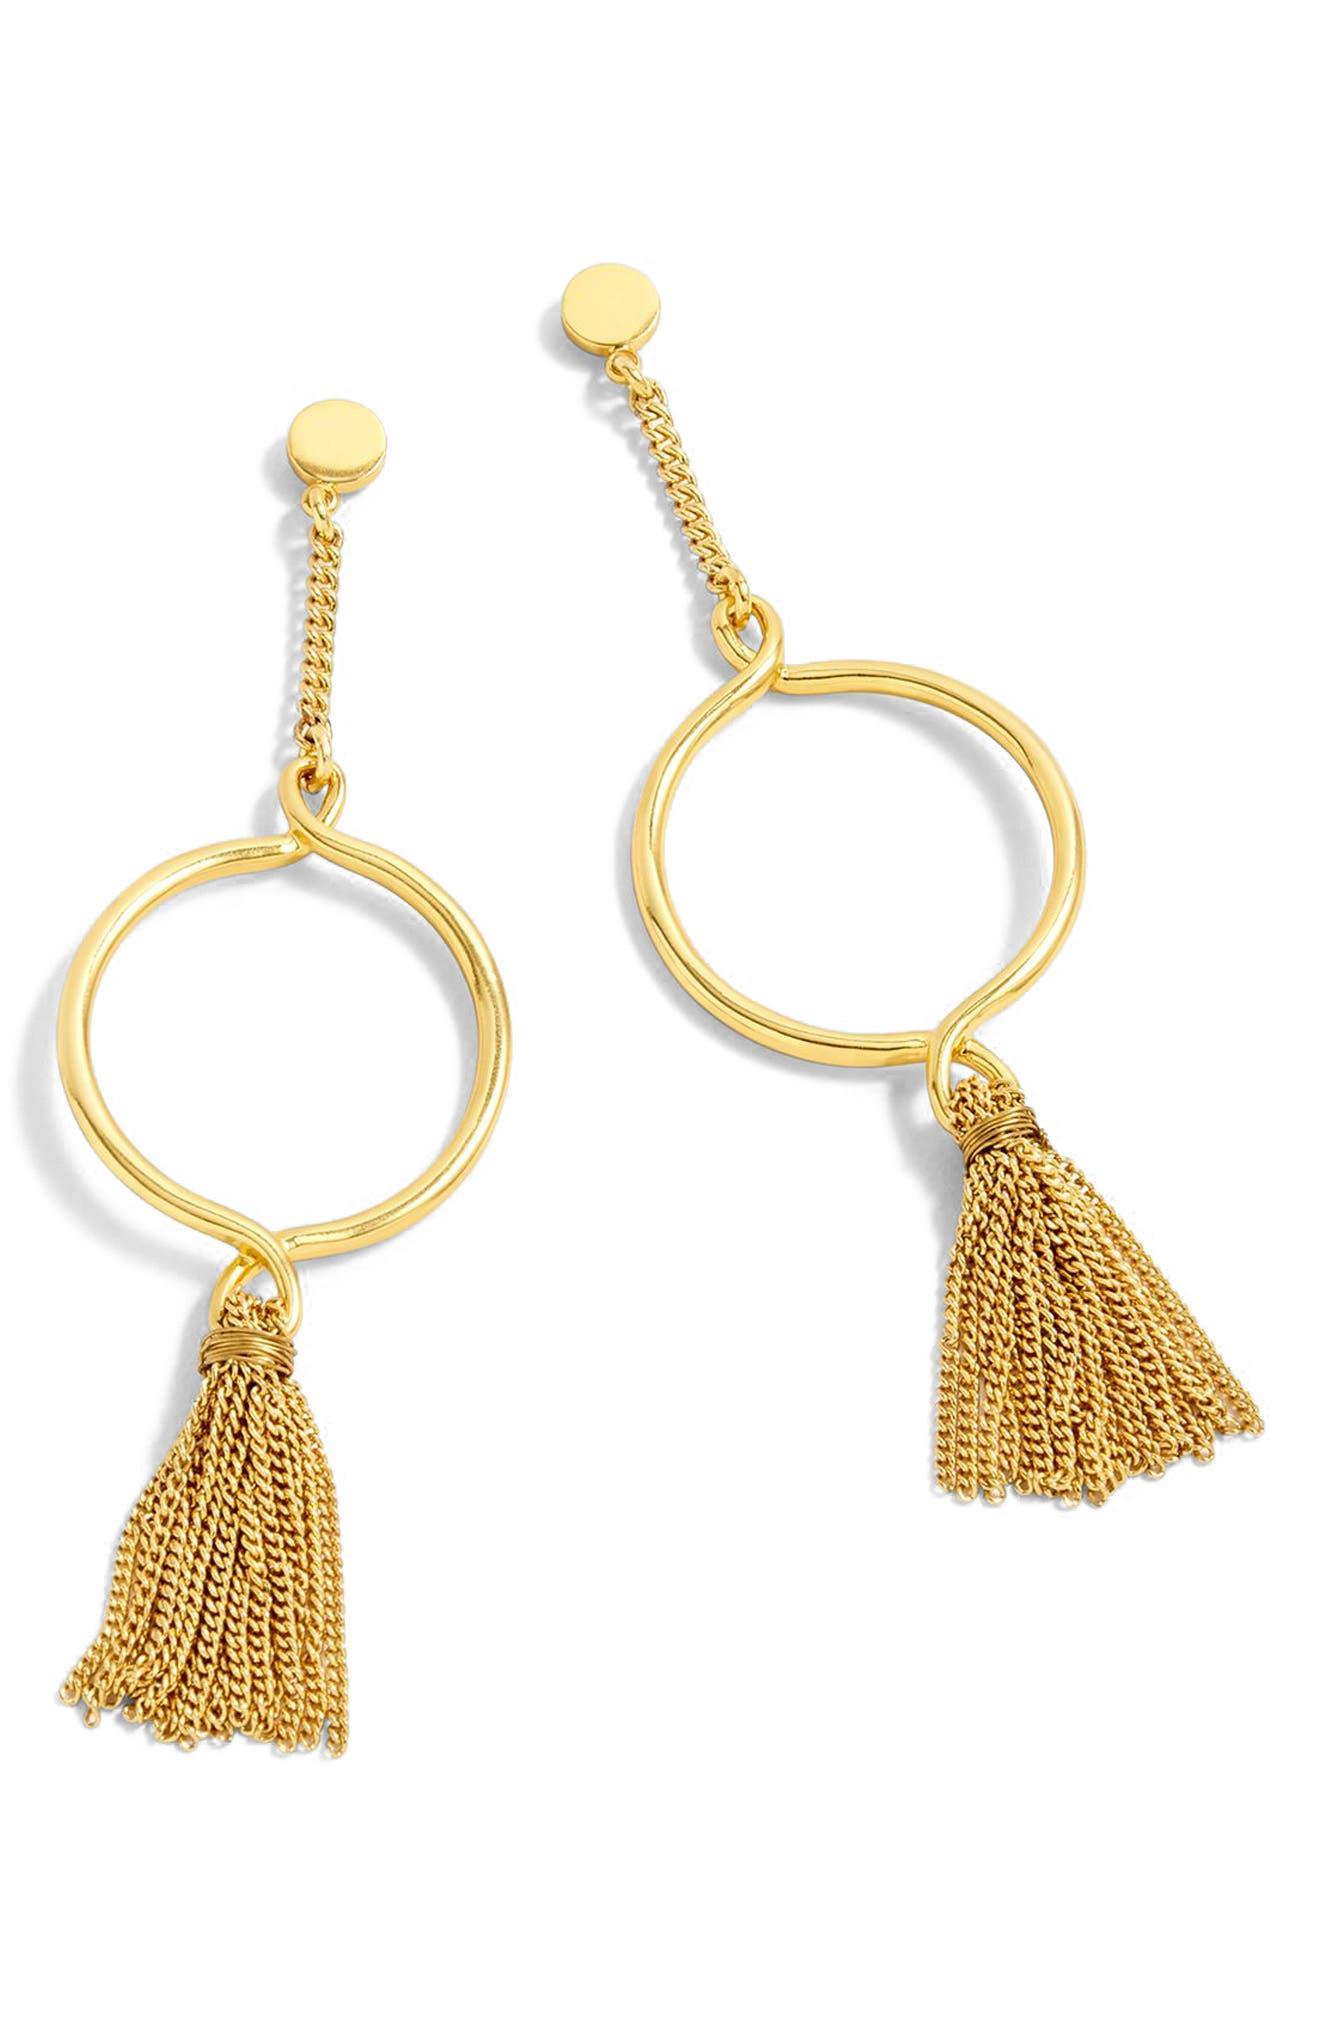 Hanging Hoop Broom Earrings,                         Main,                         color, Burnished Gold